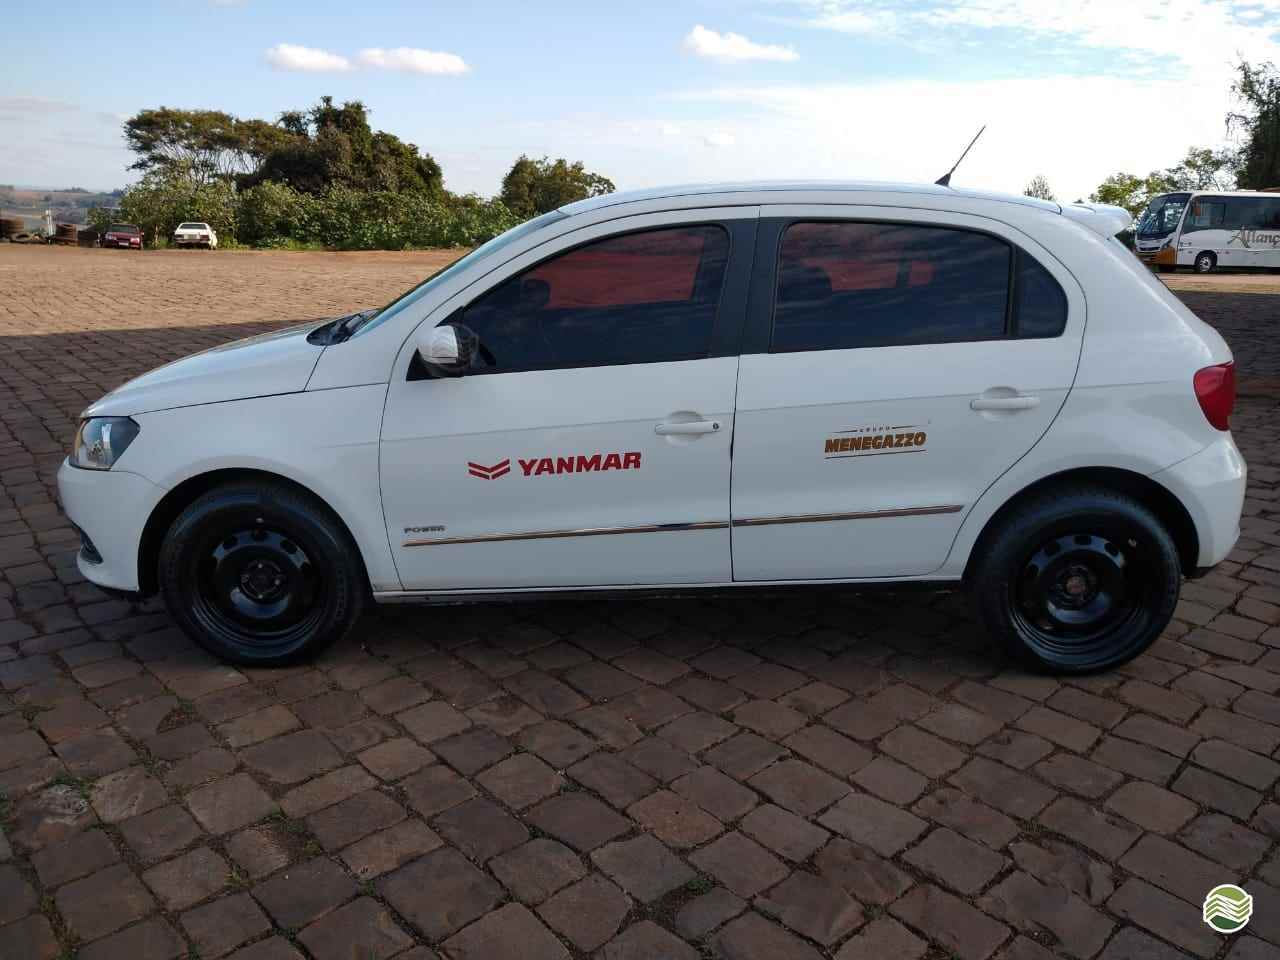 CARRO VW - Volkswagen Gol 1.6 Power Menegazzo - Yanmar Stara CONSTANTINA RIO GRANDE DO SUL RS